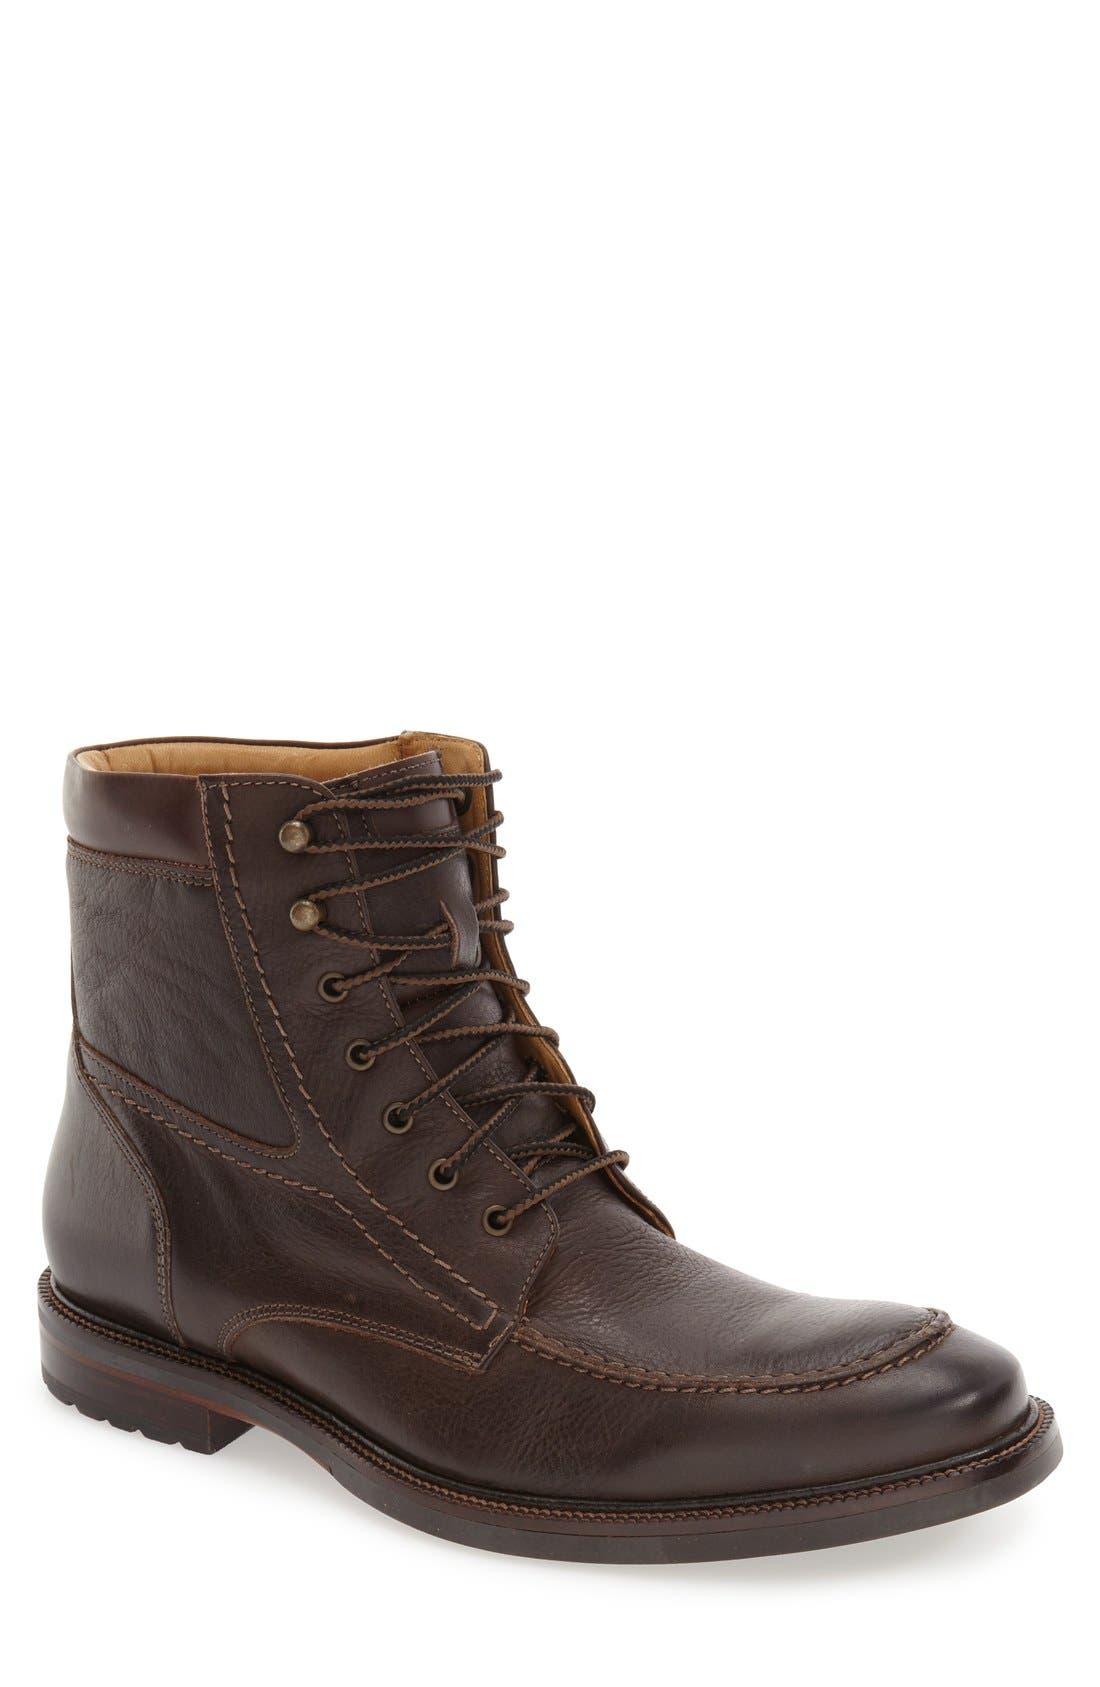 J&M 1850 'Baird' Moc Toe Boot (Men)